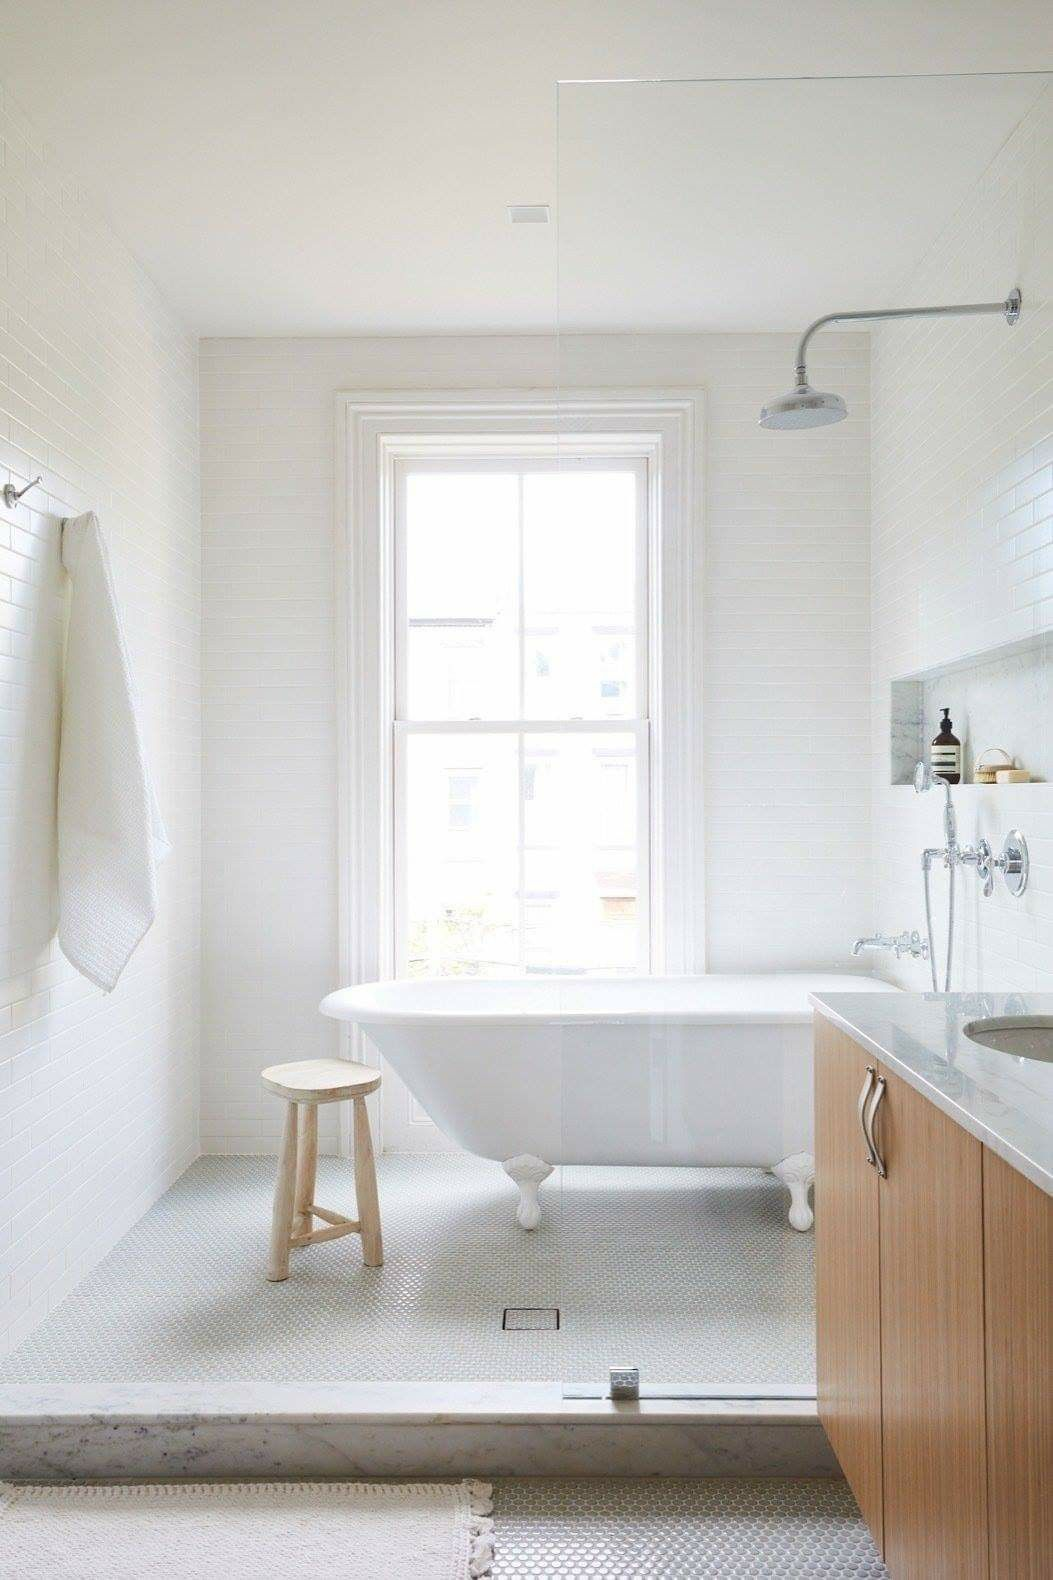 Walk In Wet Room Designs: Pin By Amy Dennill On Ball & Claw Bathtubs